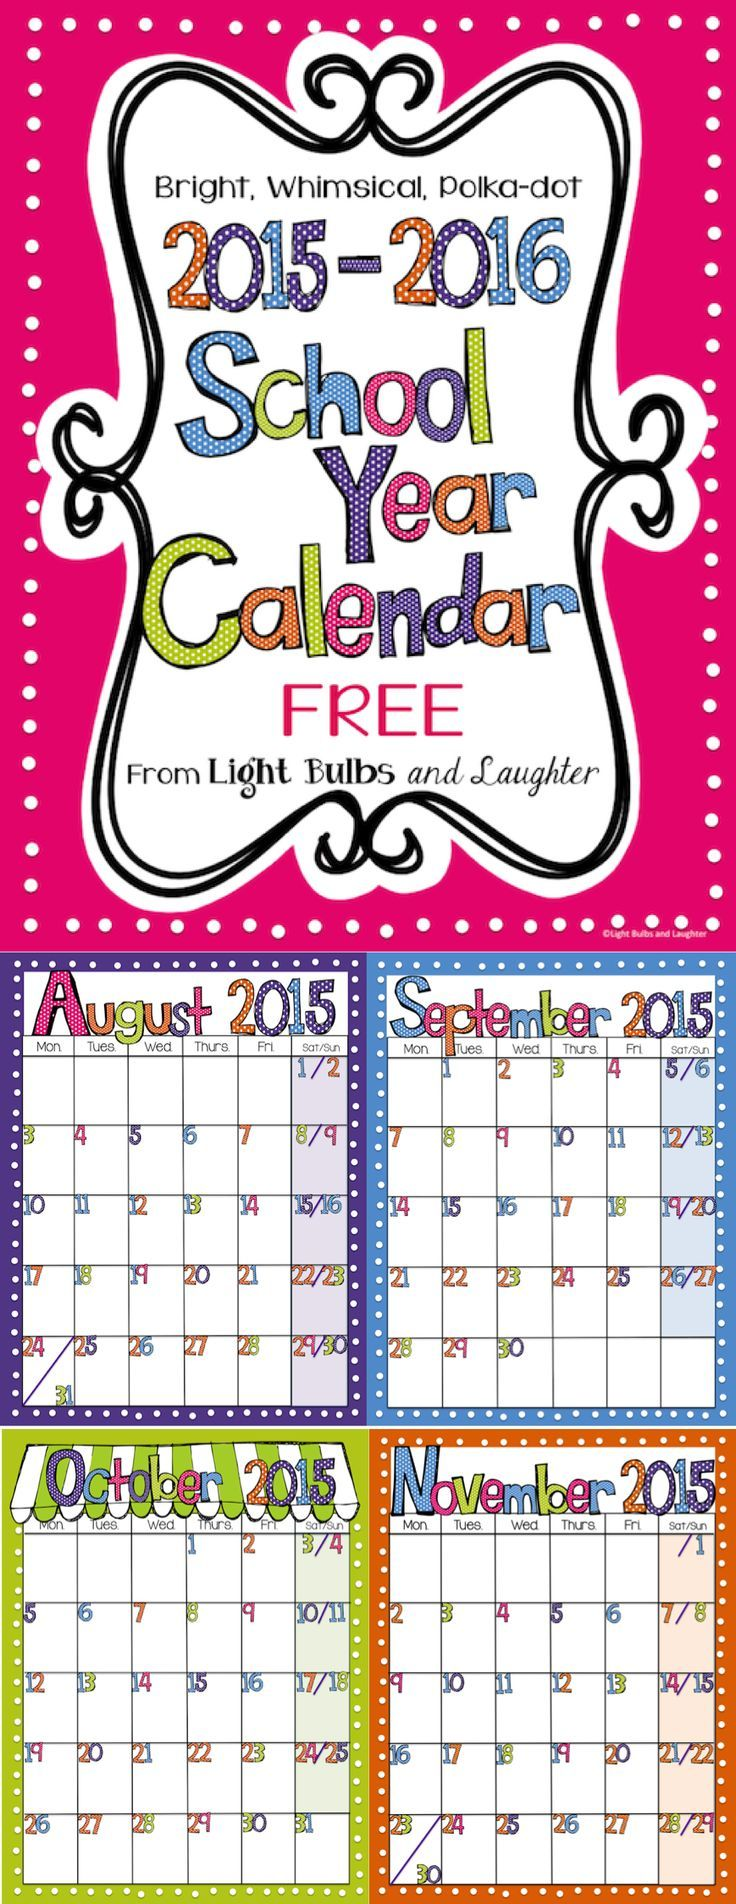 free 2015 printable calendar | 2015 Calendar - Printable - Red ...